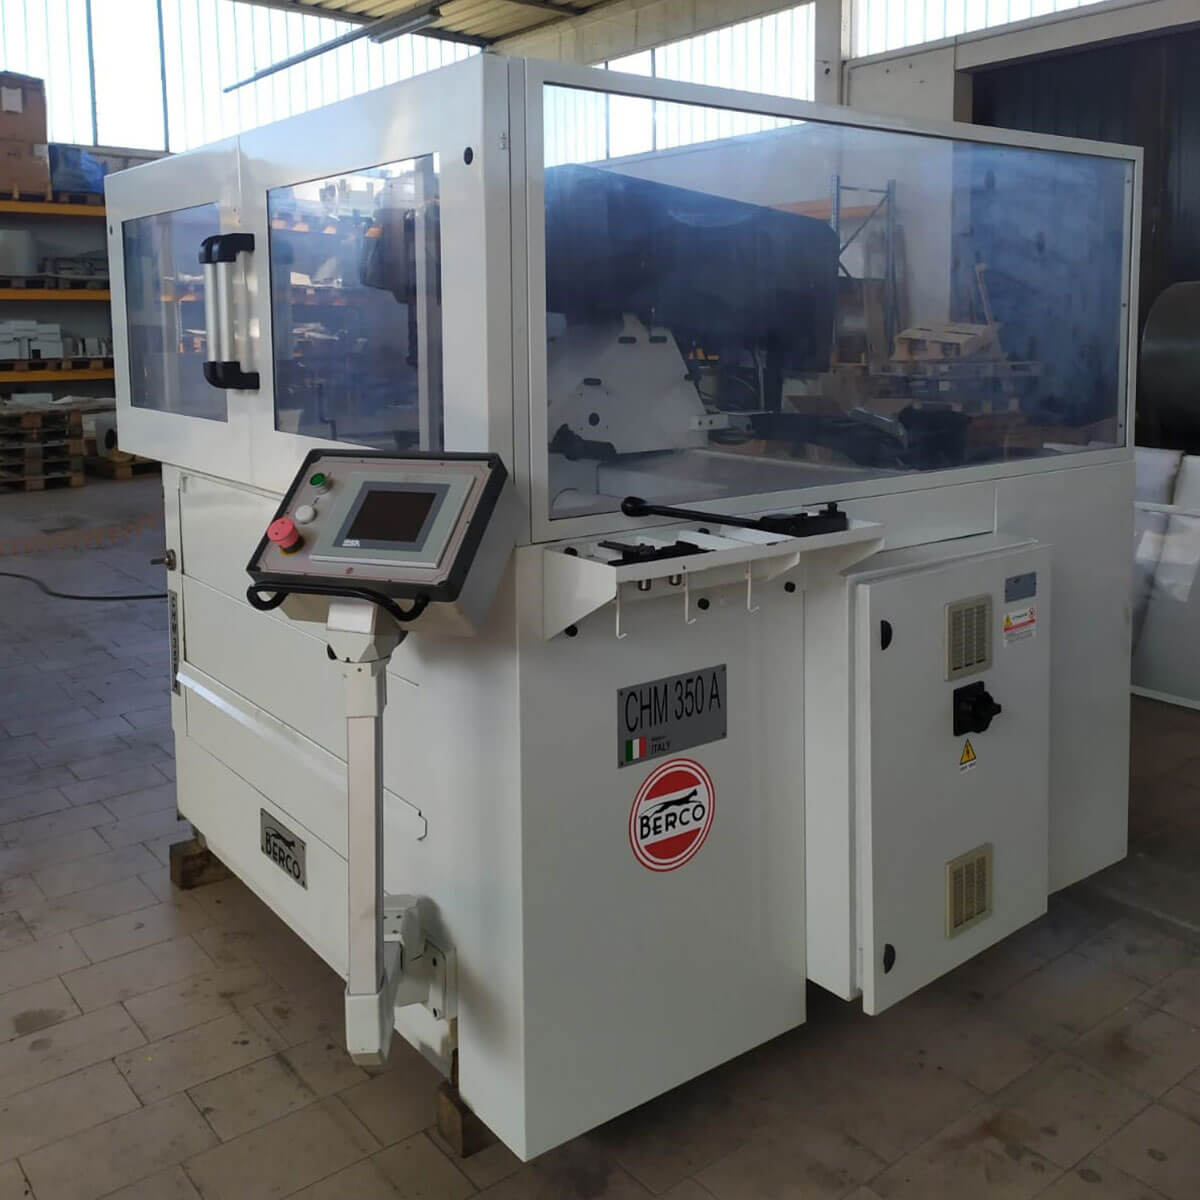 MU804 - BERCO CHM350 Used Cylinder Honing Machine